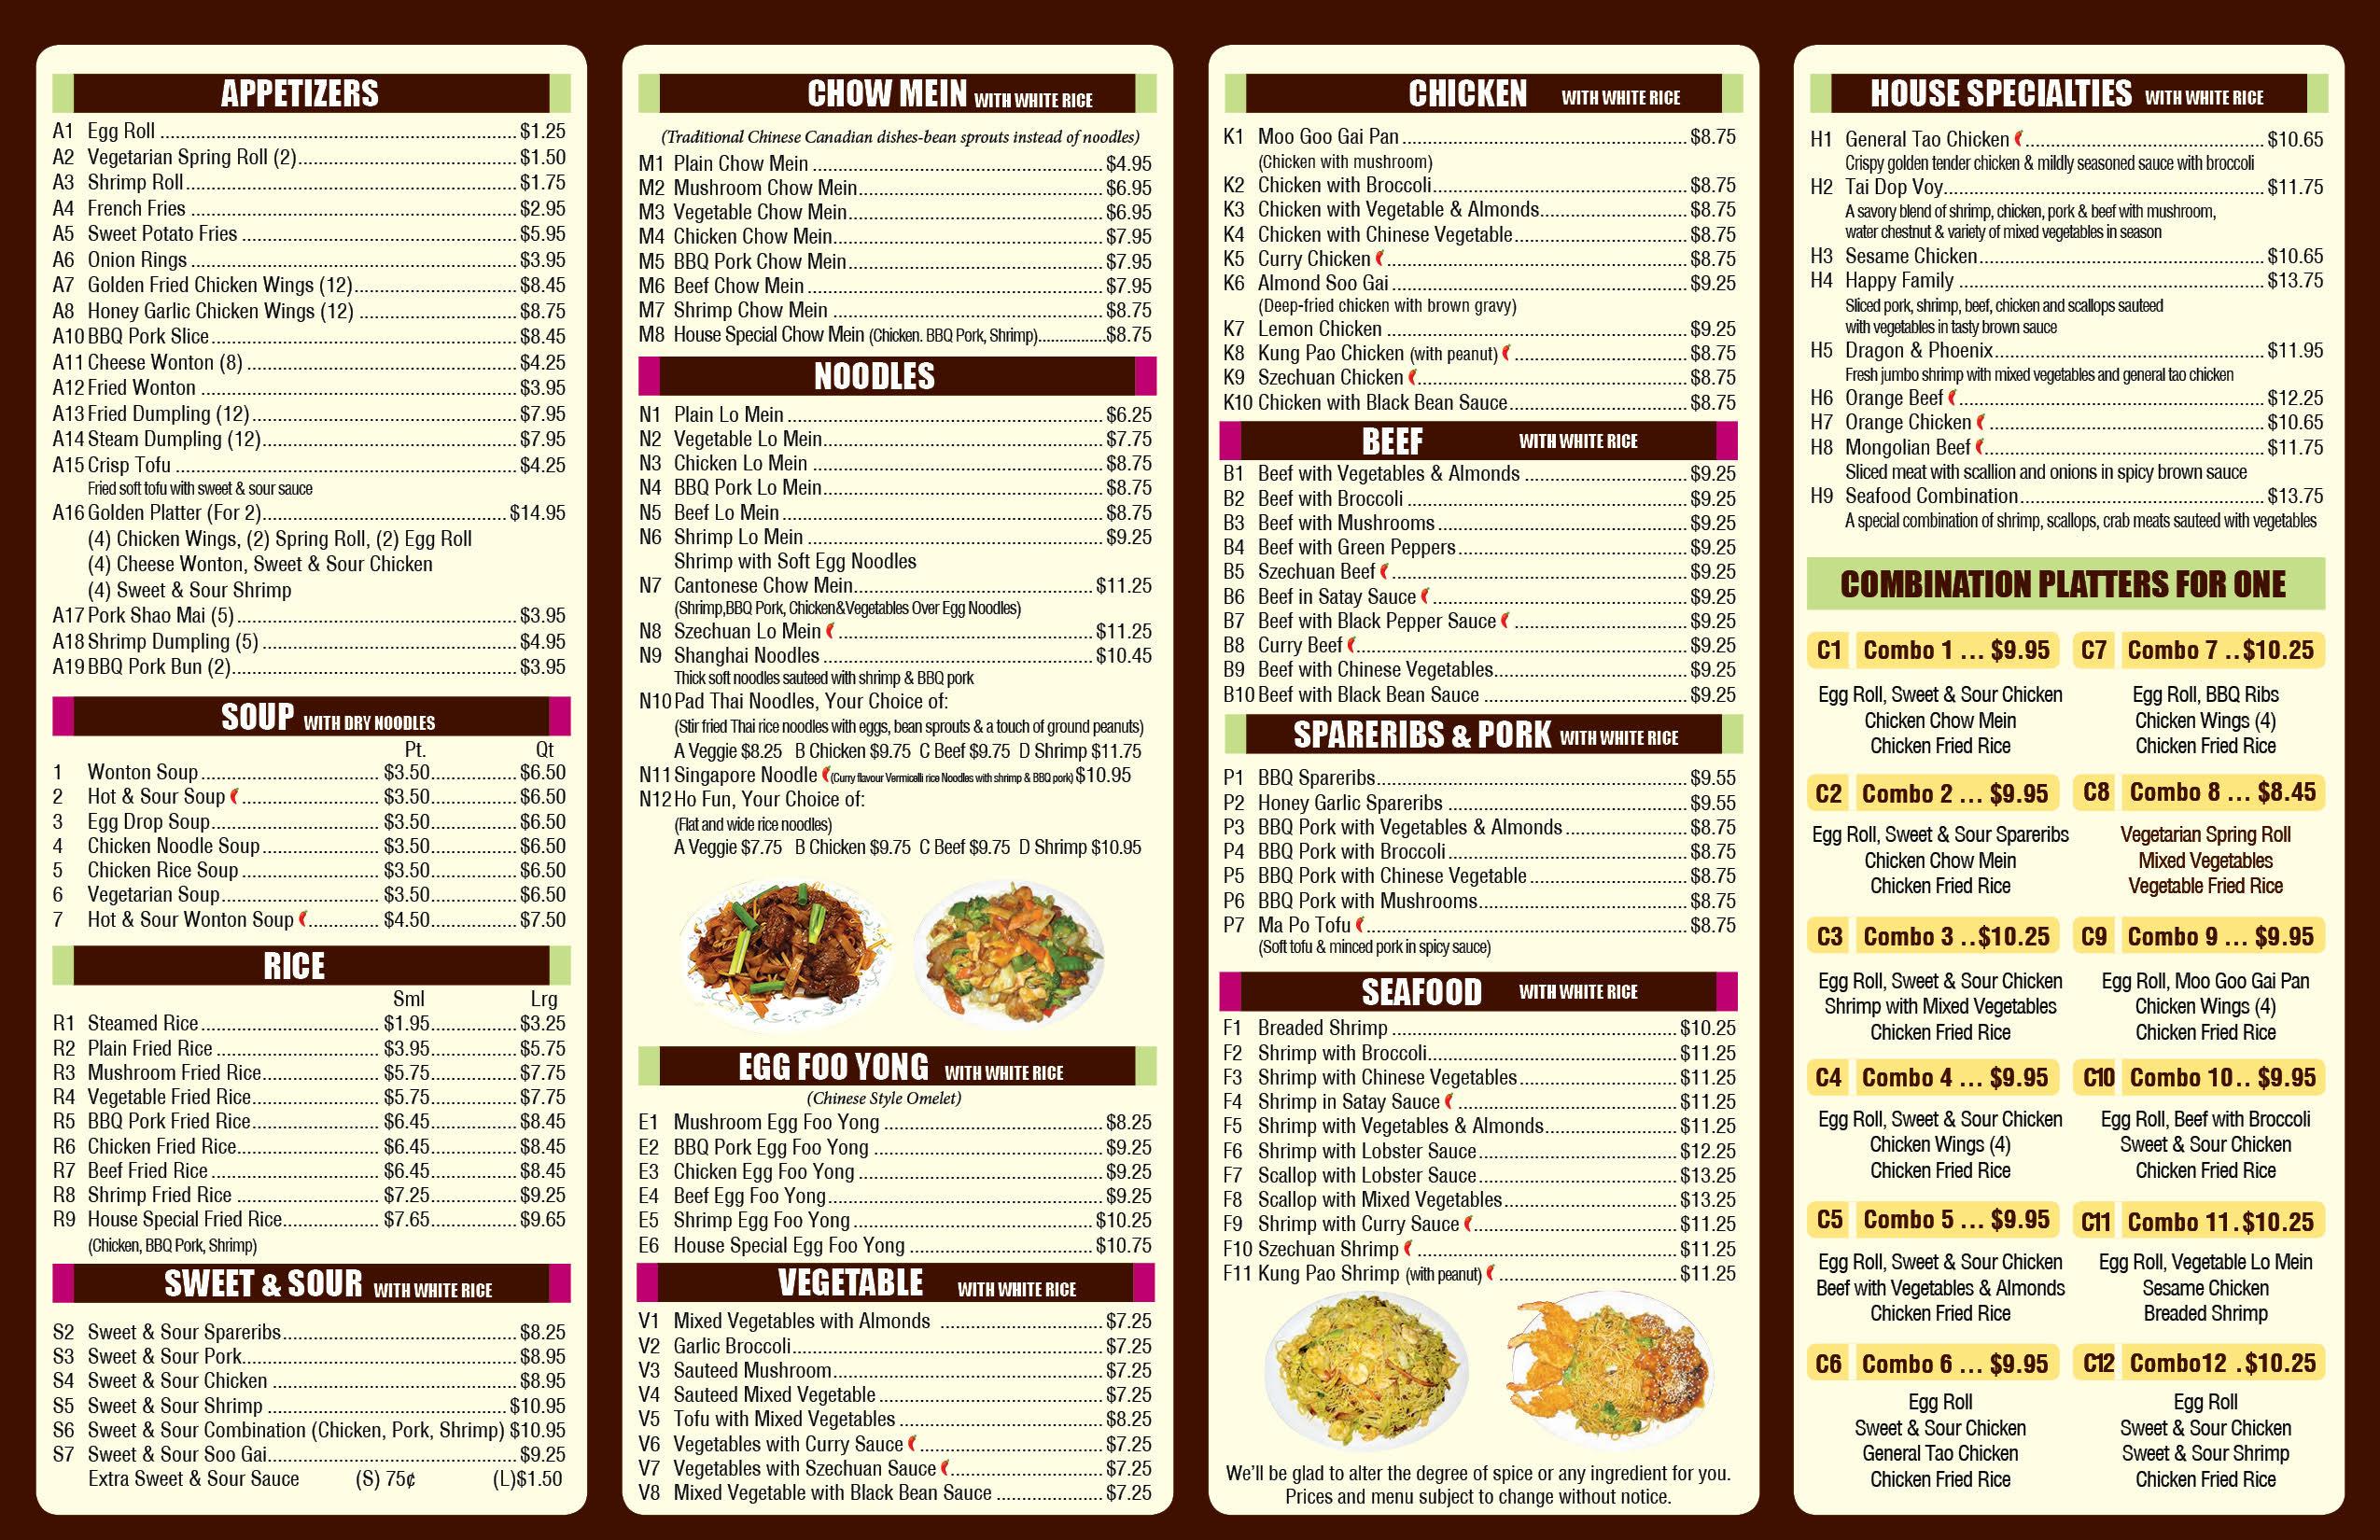 98-collingwood-menu